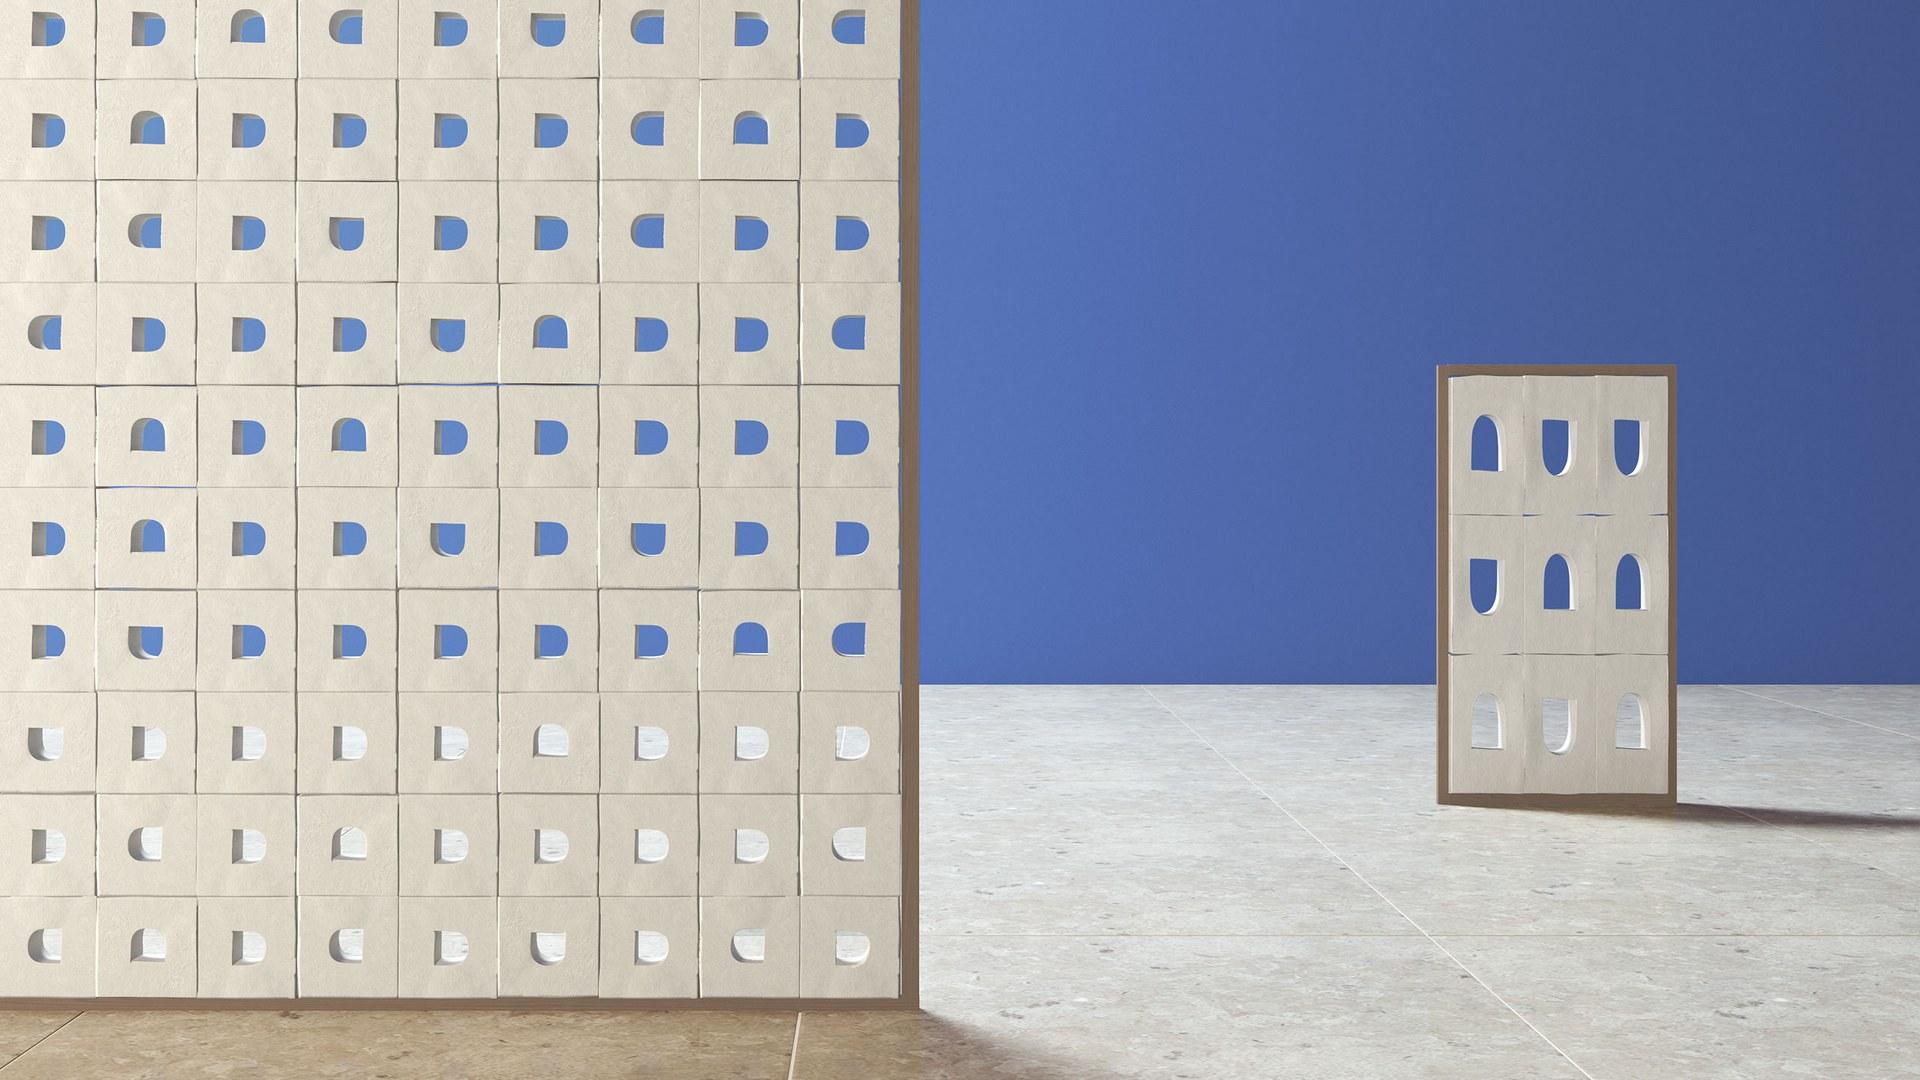 Antonym Tiles - Variation